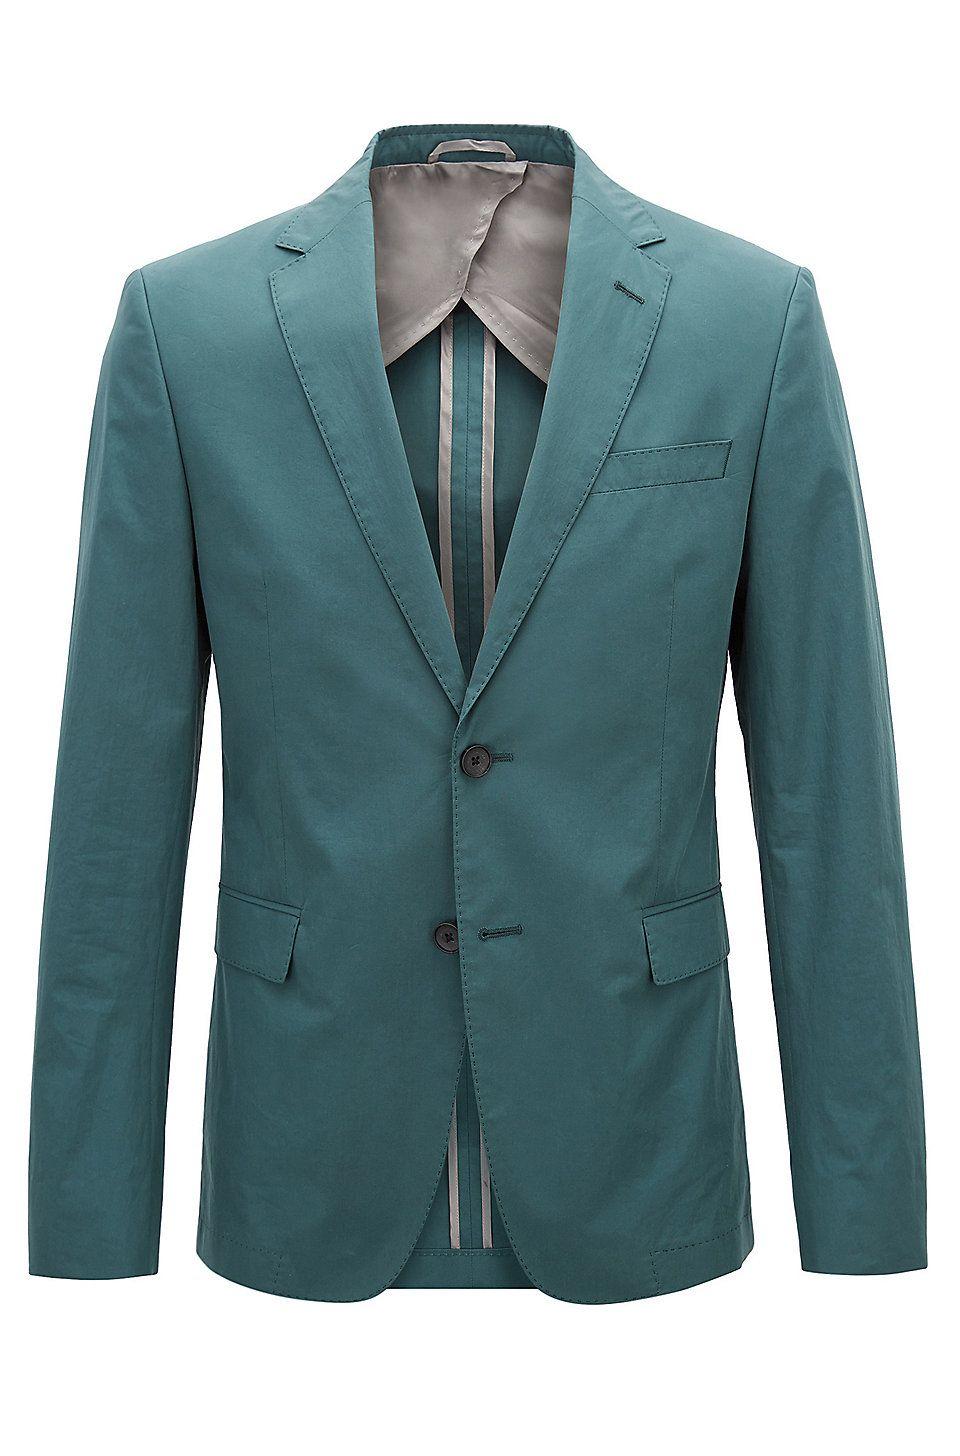 7cb6a7b5 HUGO BOSS Slim-fit blazer in paper-touch cotton poplin - Dark Green Blazers  from BOSS for Men in the official HUGO BOSS Online Store free shipping